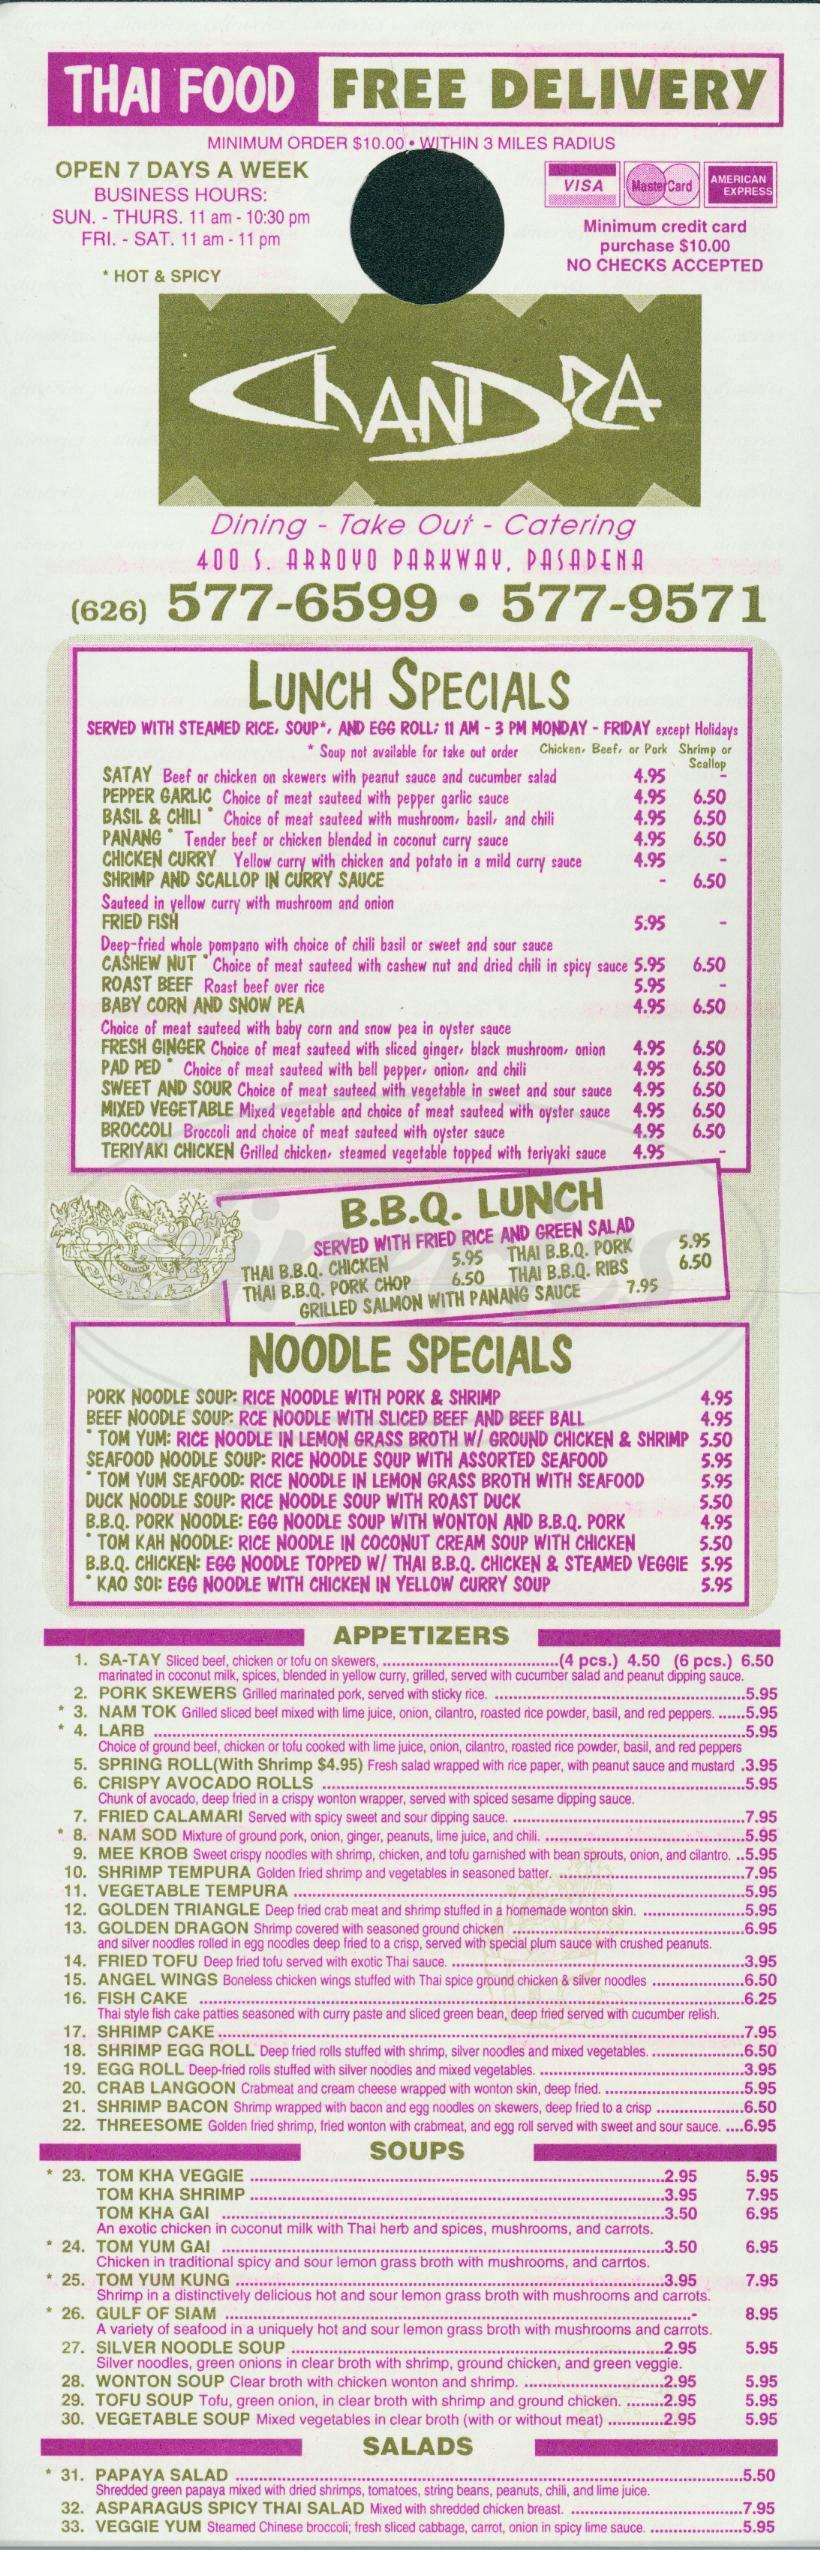 menu for Chandra Thai Restaurant